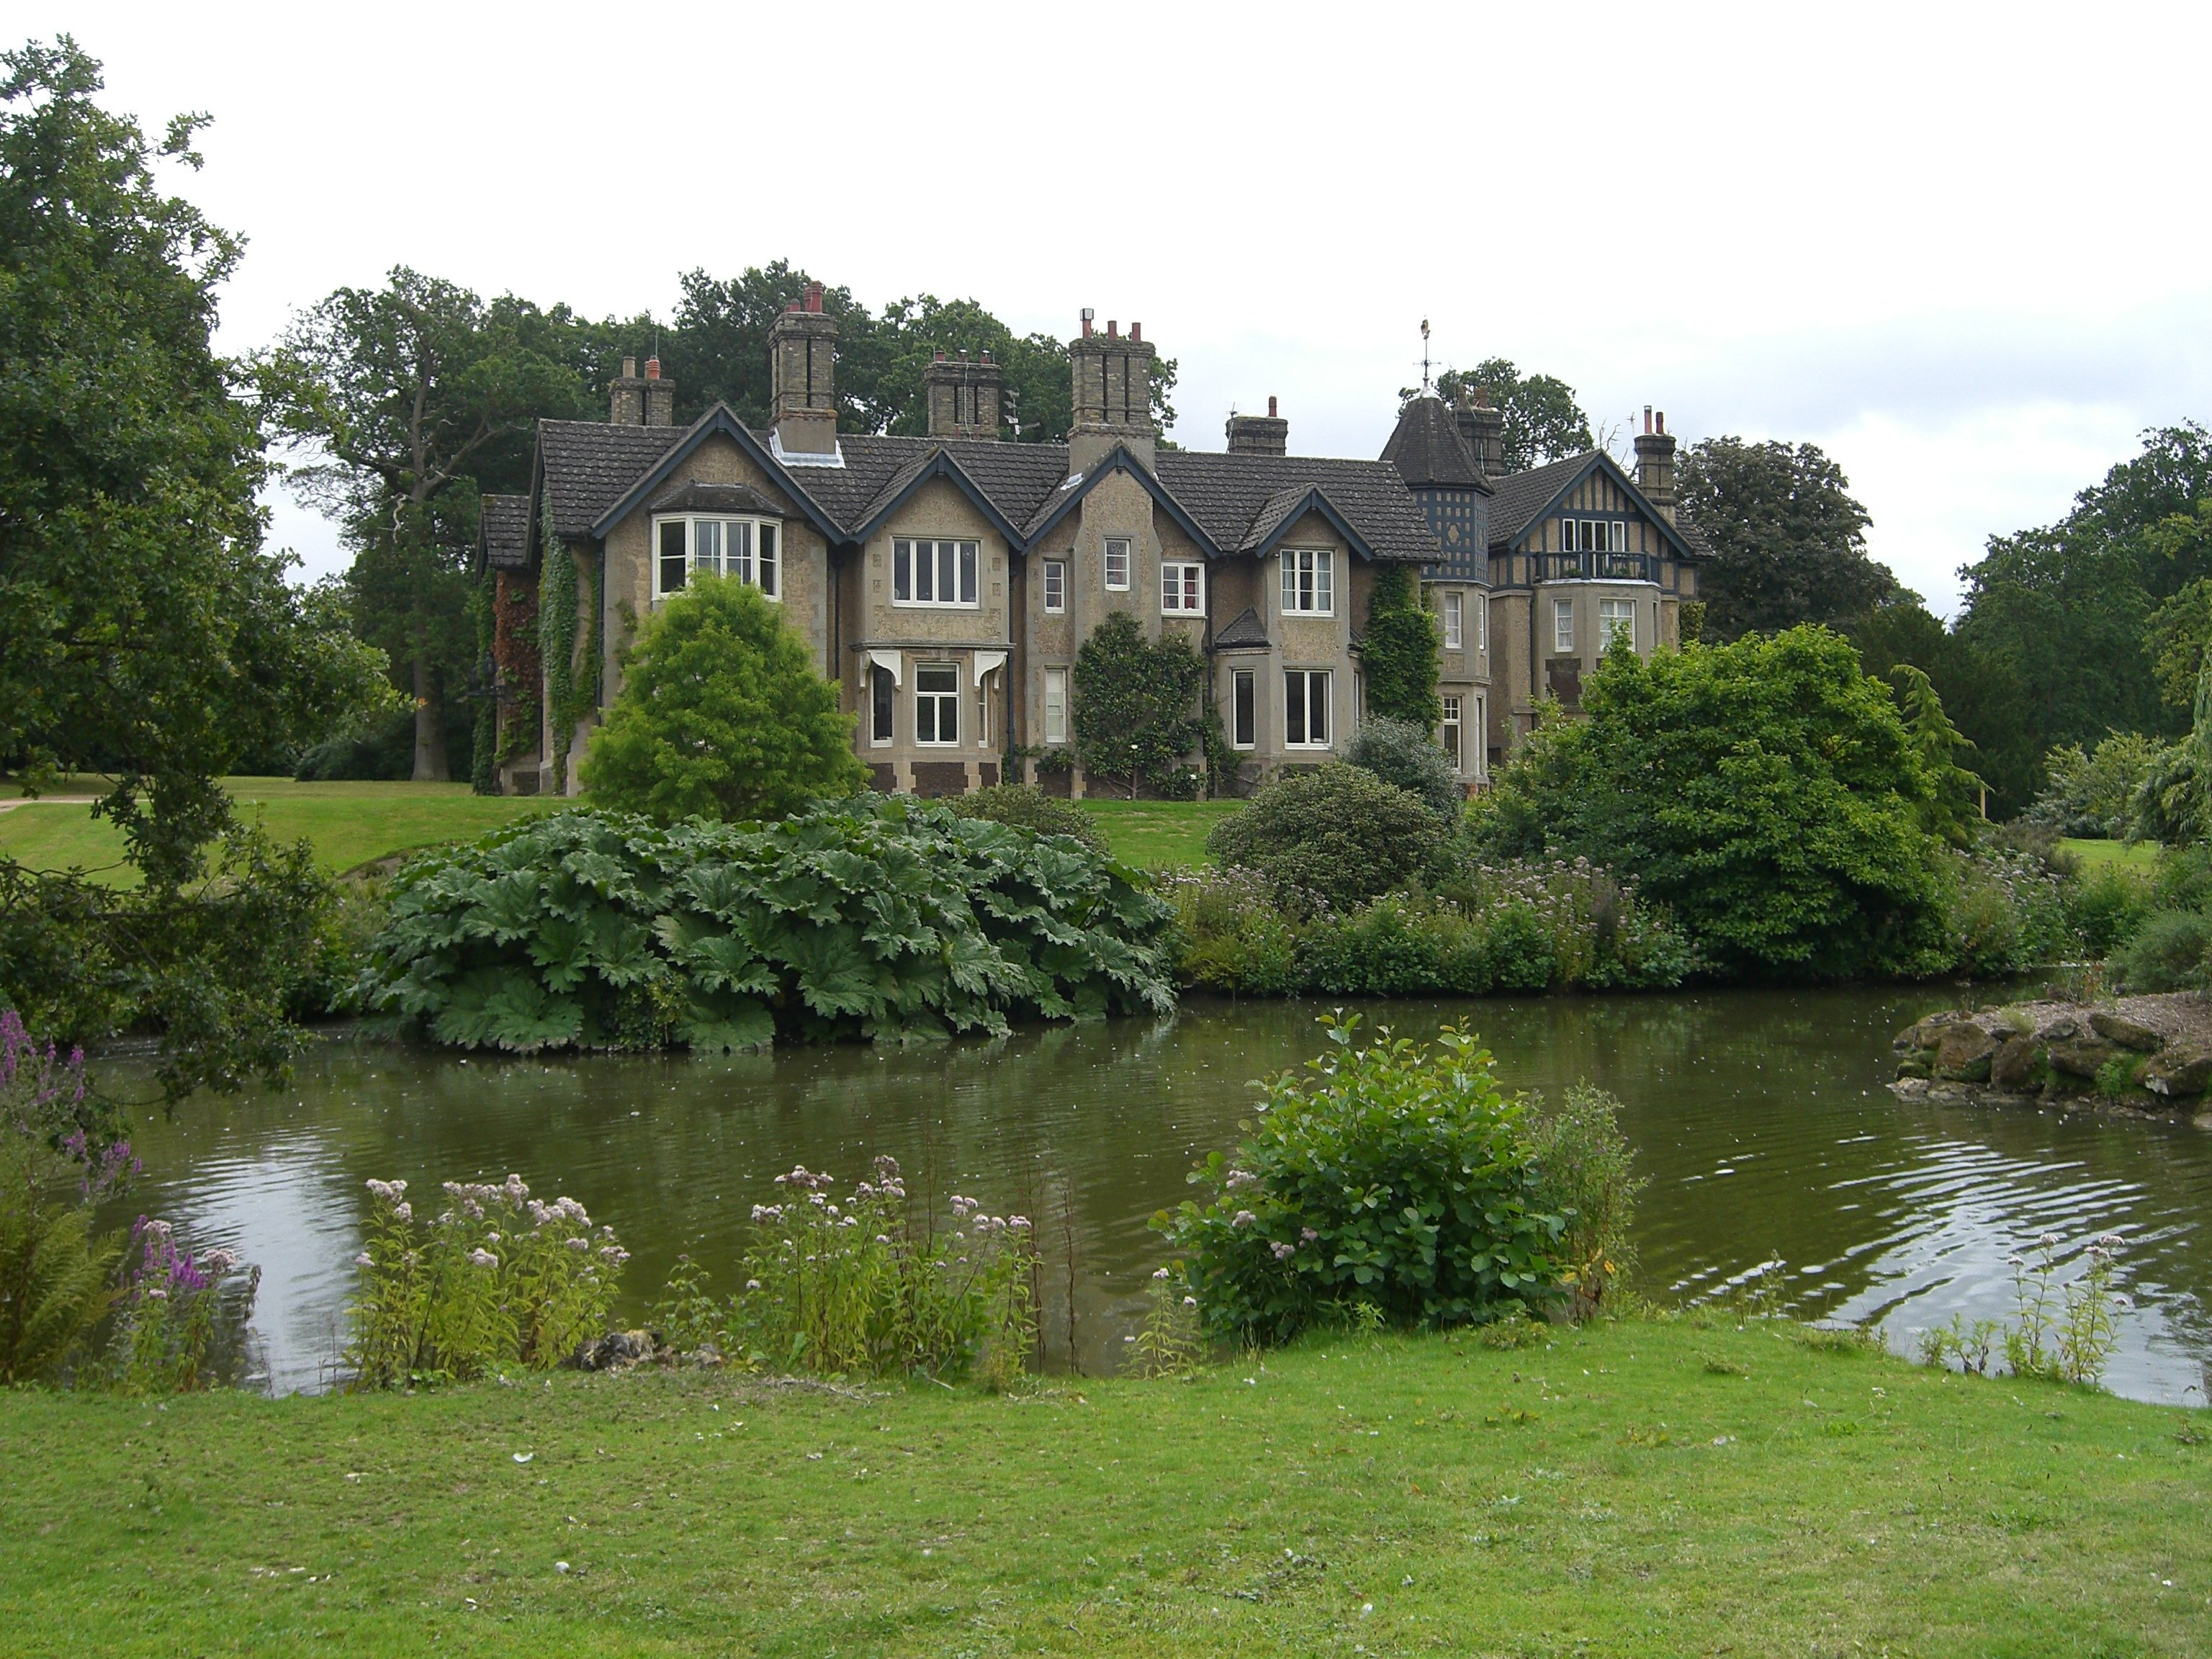 FileYork Cottage Sandringham Estate  panoramiojpg  Wikimedia Commons